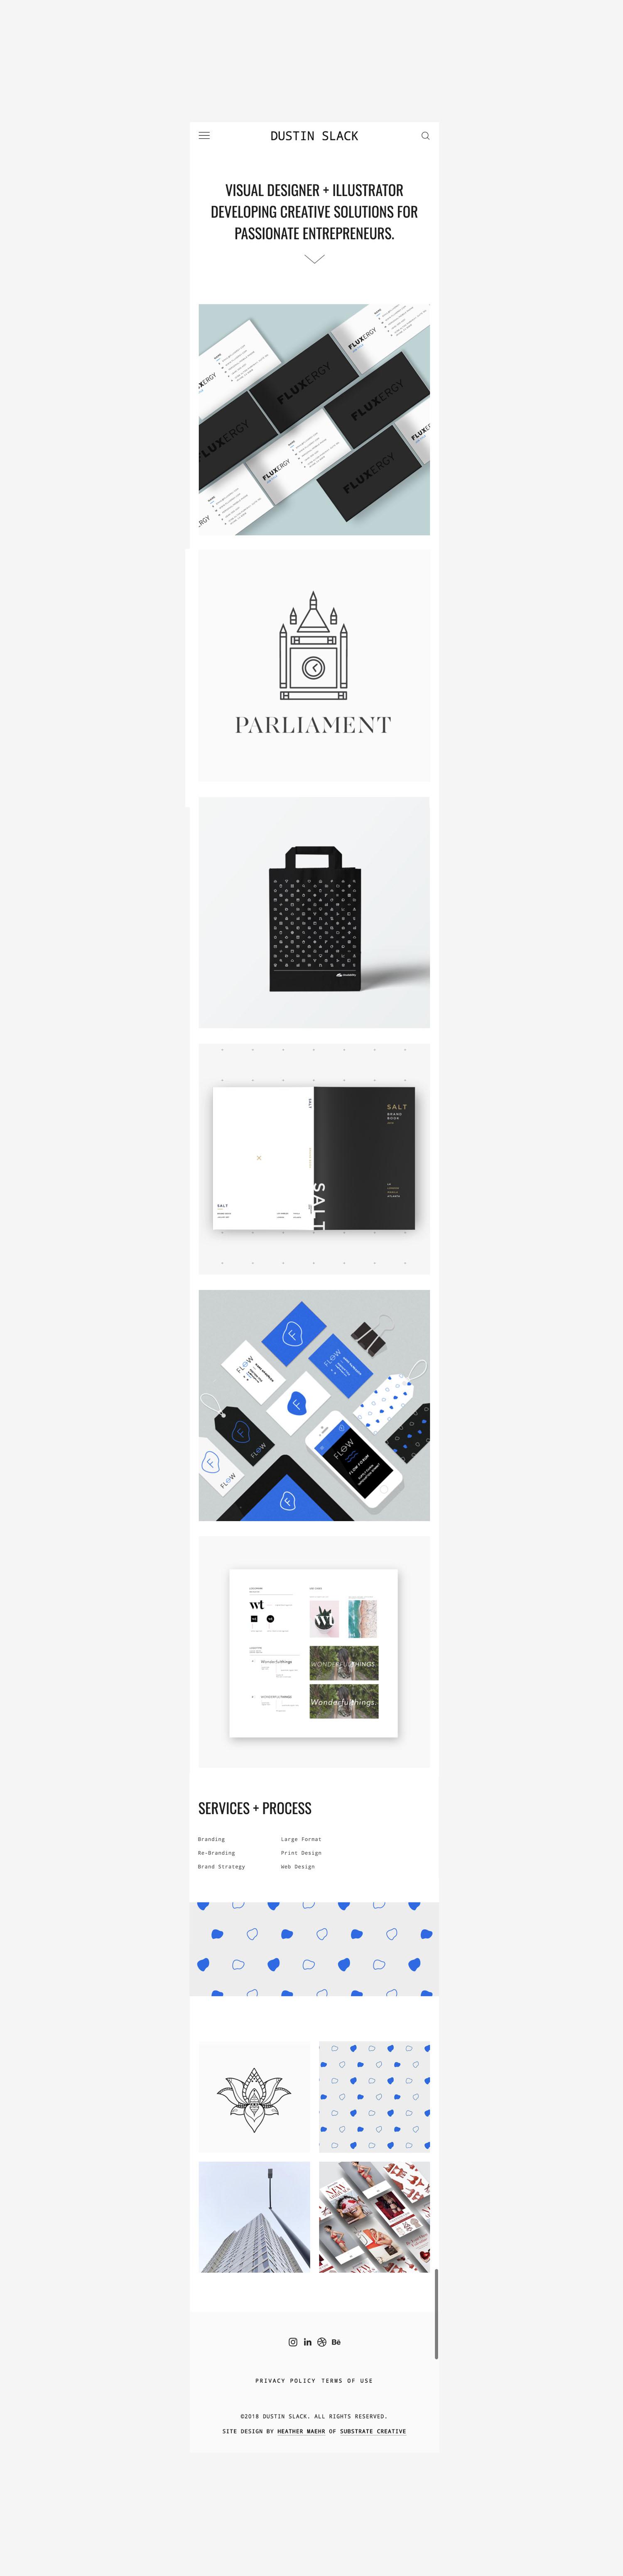 Dustin-Slack-Portfolio-Website-Design-Squarespace-Heather-Maehr-Portland-Designer.jpg